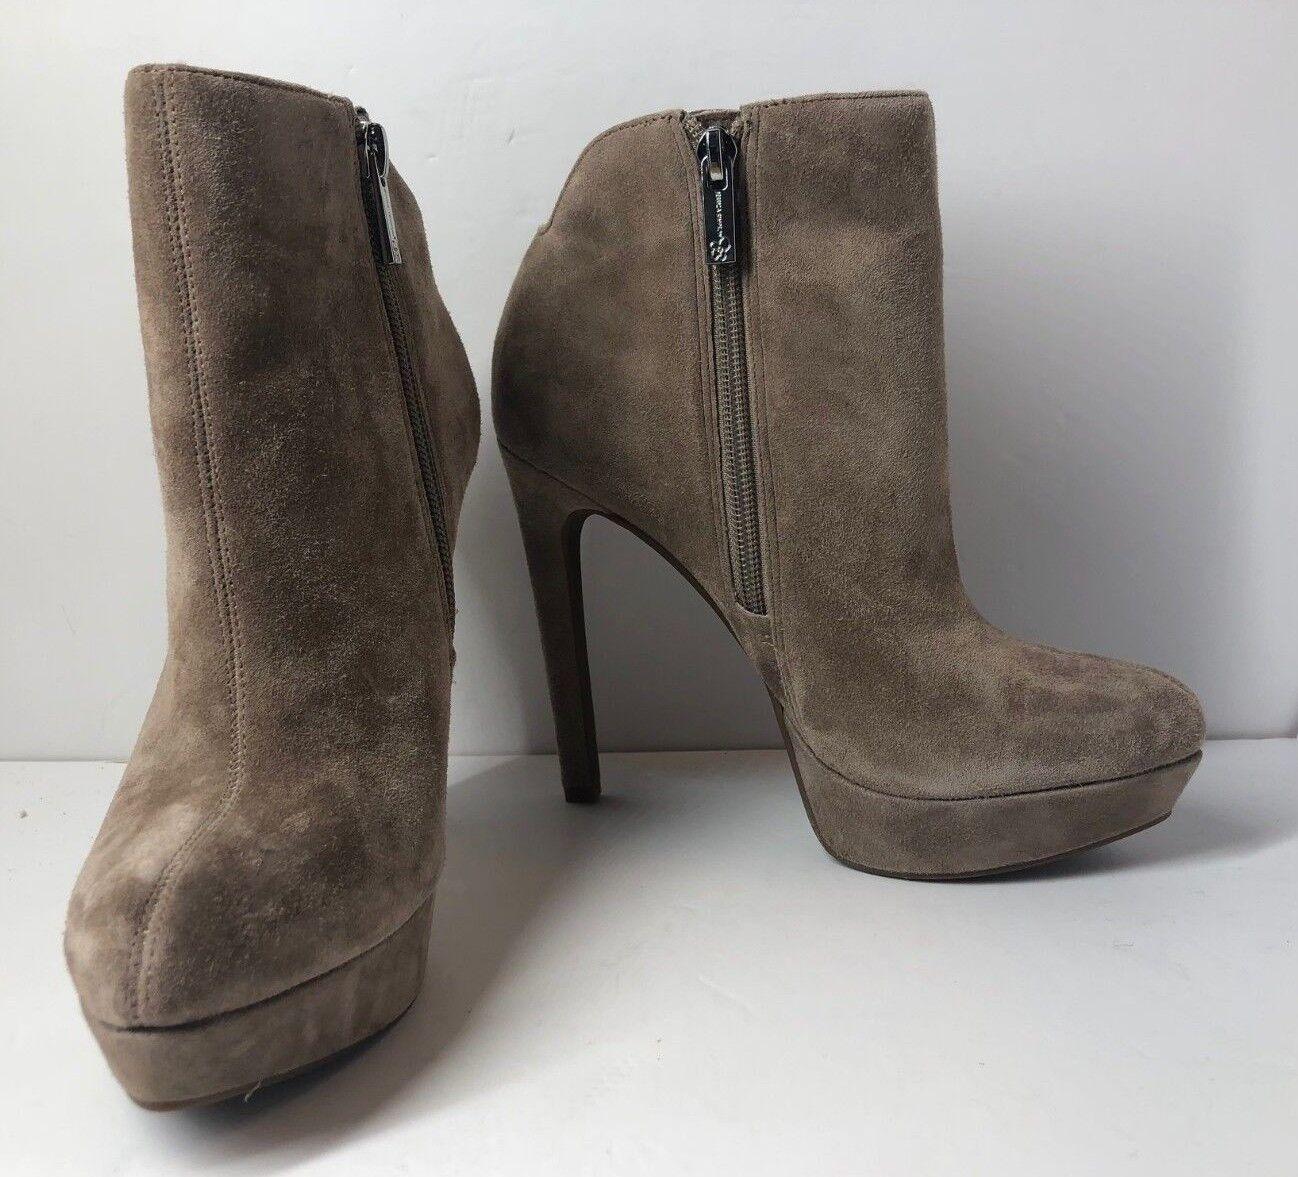 Jessica Simpson JS-ZAMIA For Women Zamia Ankle Bootie in Various Sizes